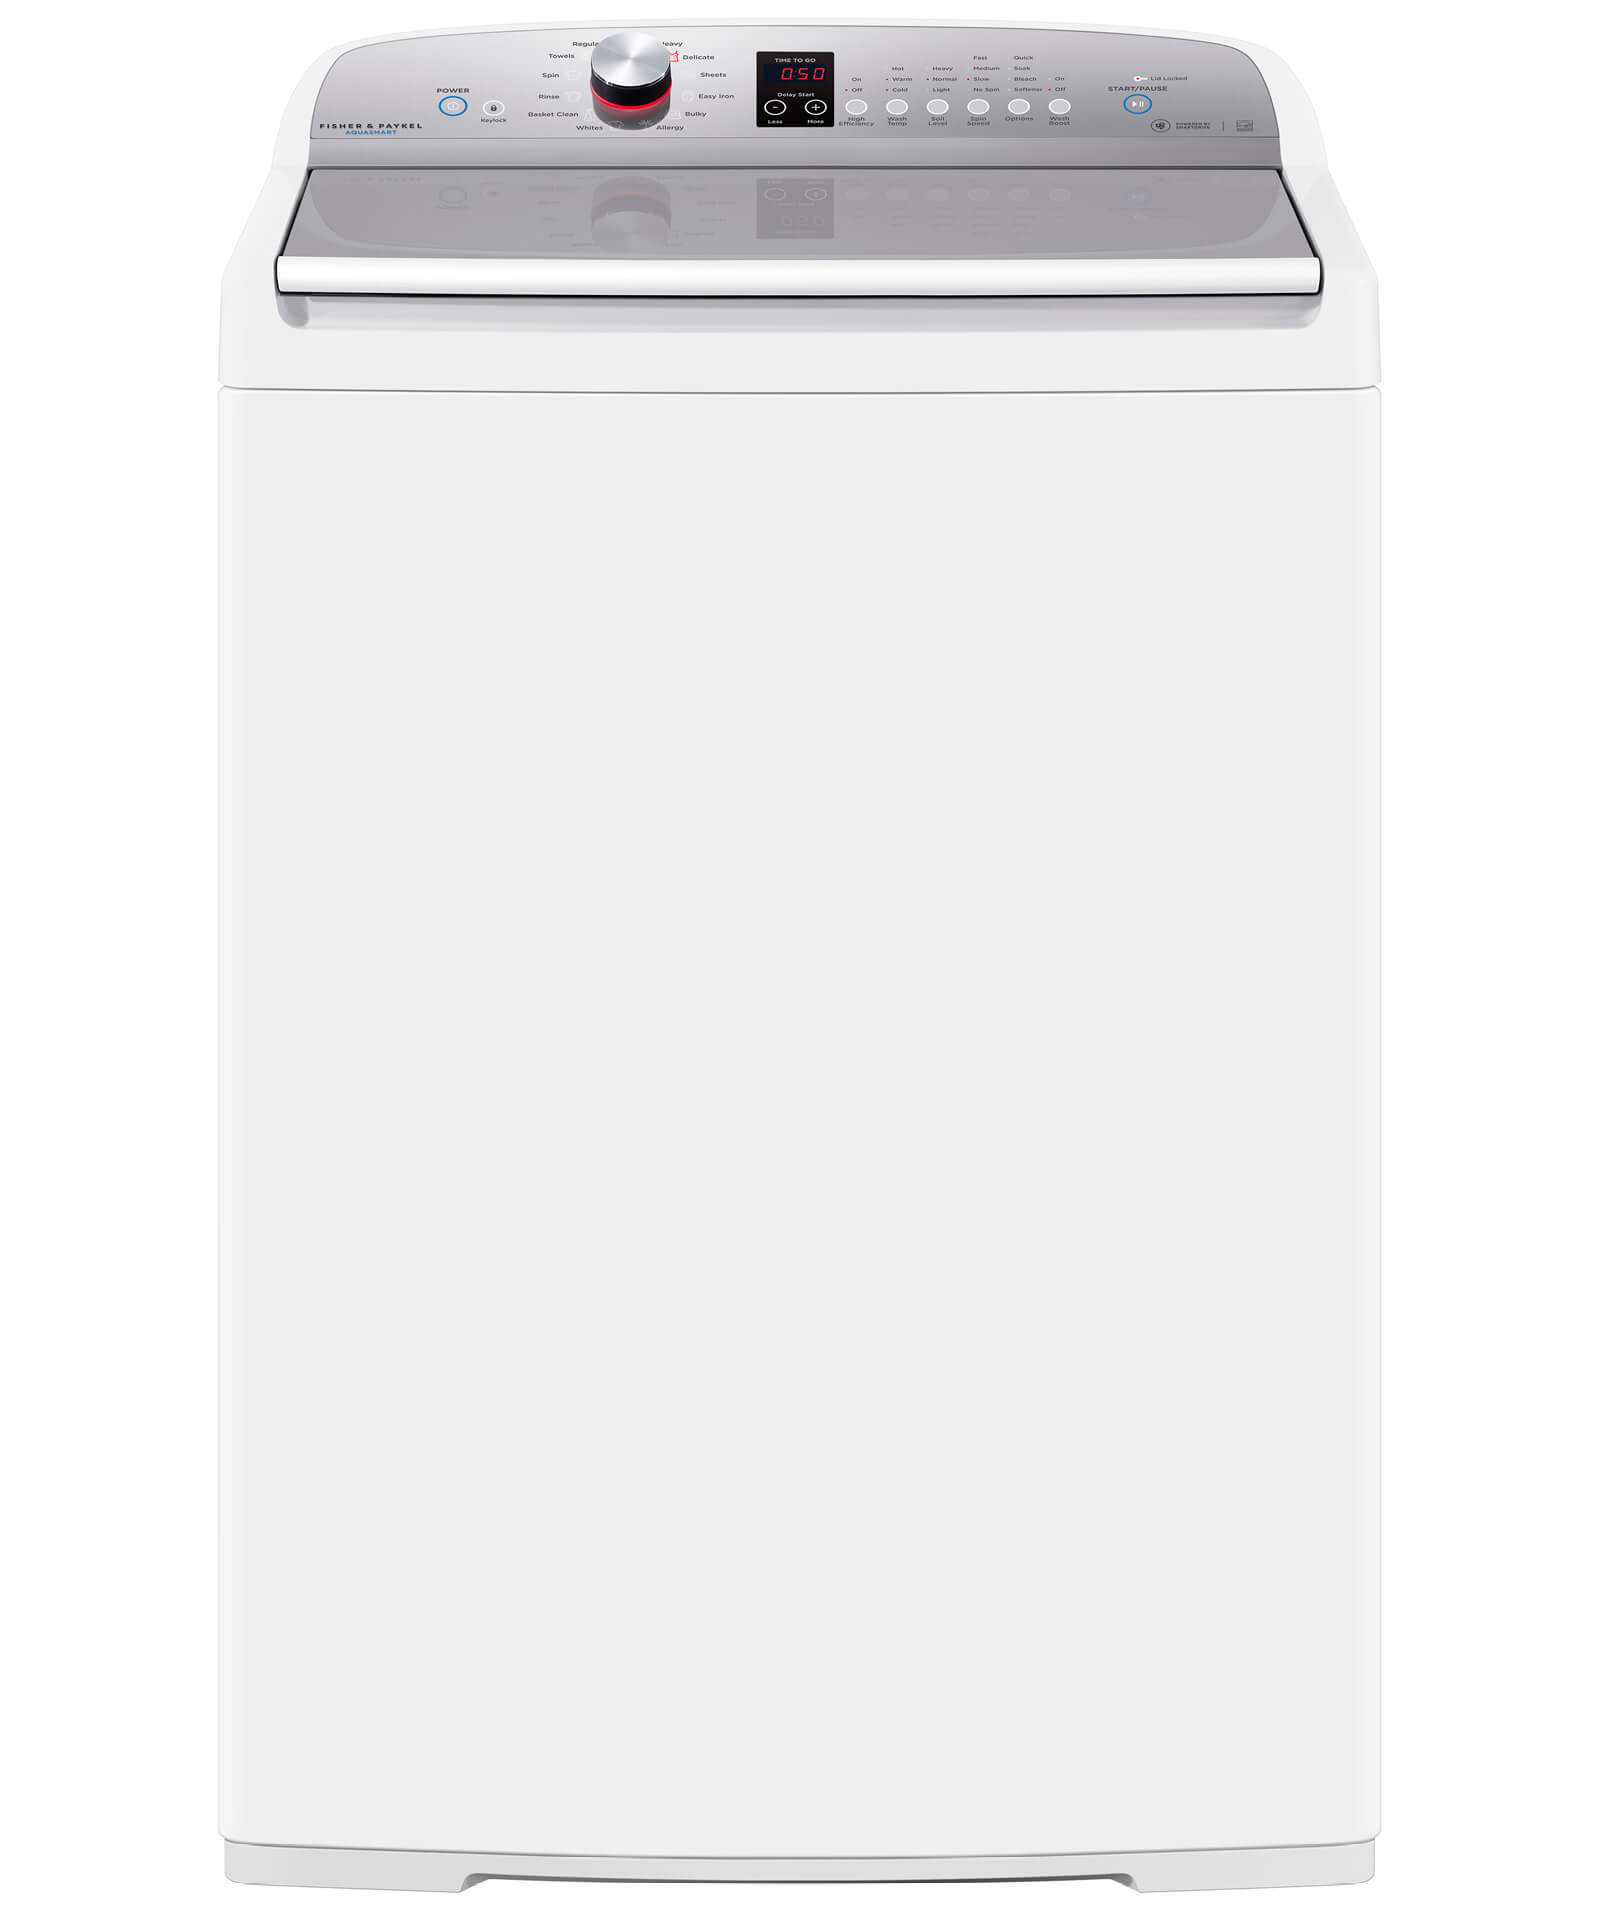 Fisher and Paykel Top Loader Washing Machine, 4 cu ft AquaSmart™